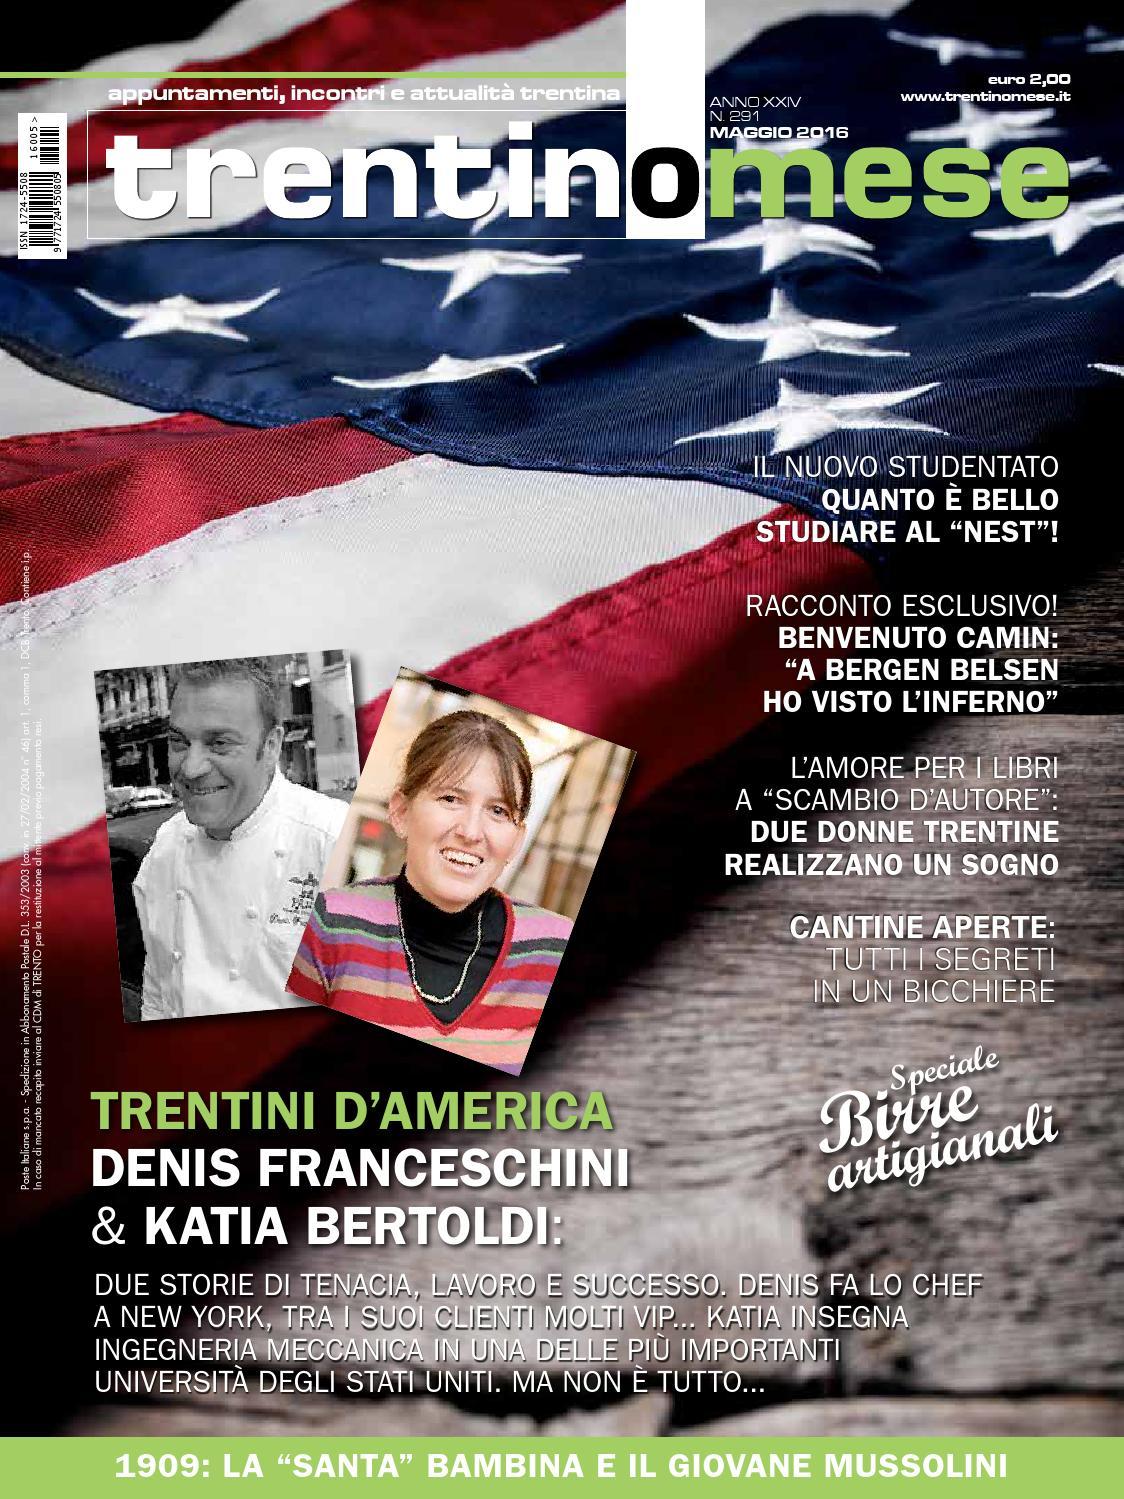 TrentinoMese maggio 2016 by Curcu Genovese - issuu 01df5906d3f